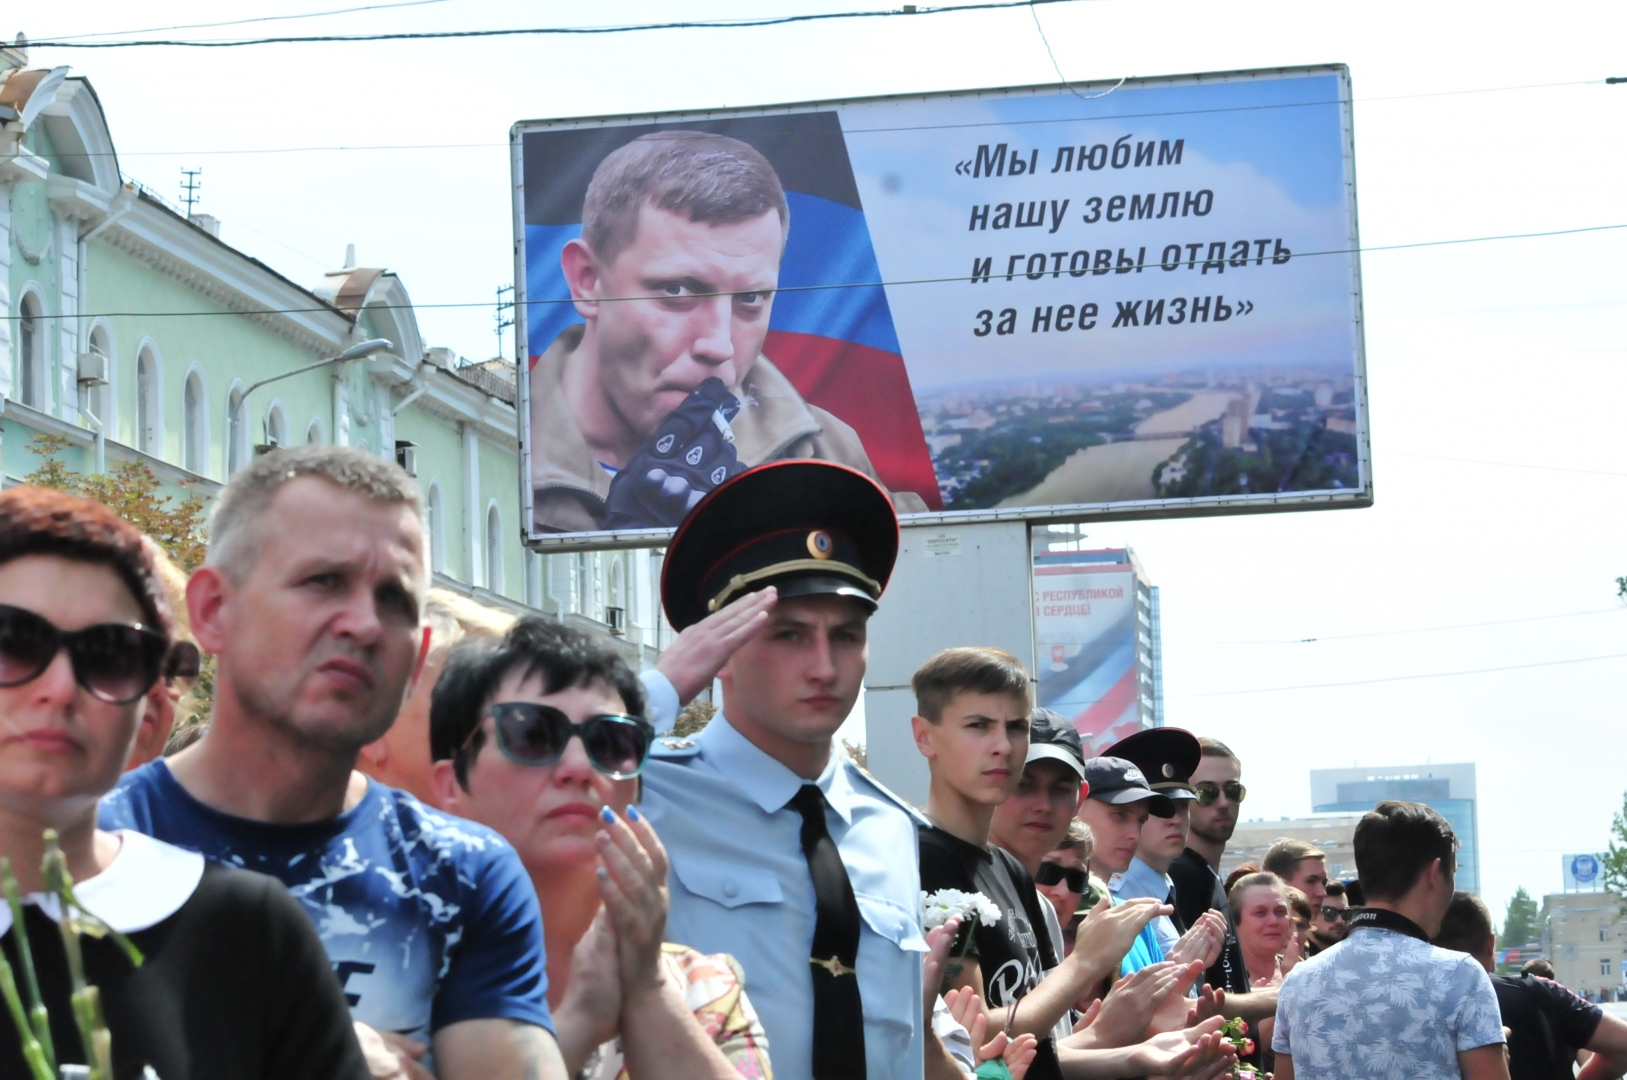 Люди прощаются с Александром Захарченко